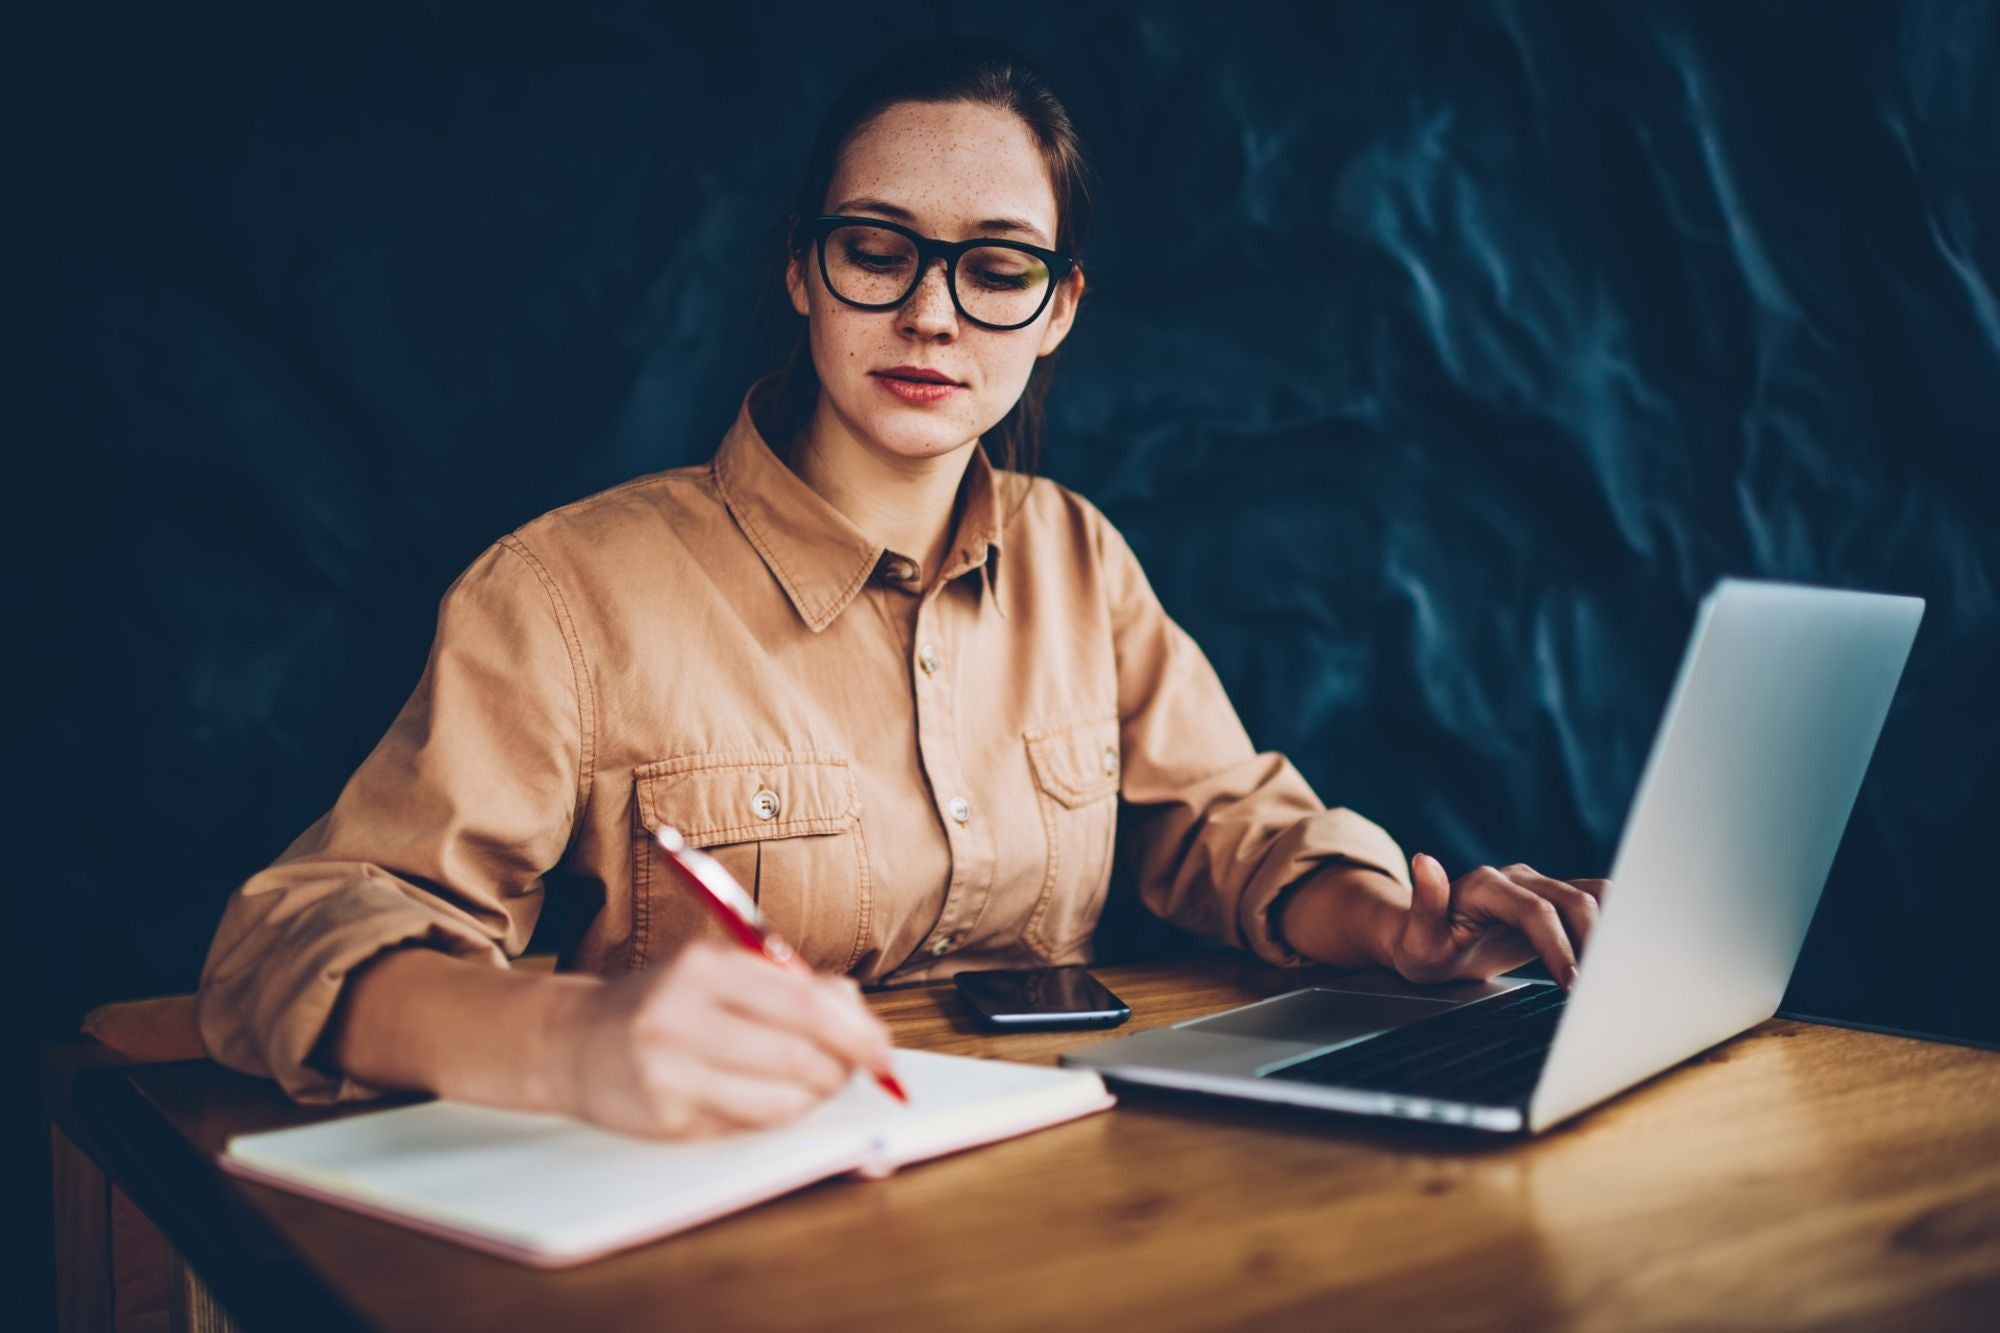 6 Cursos gratuitos de marketing para tu negocio